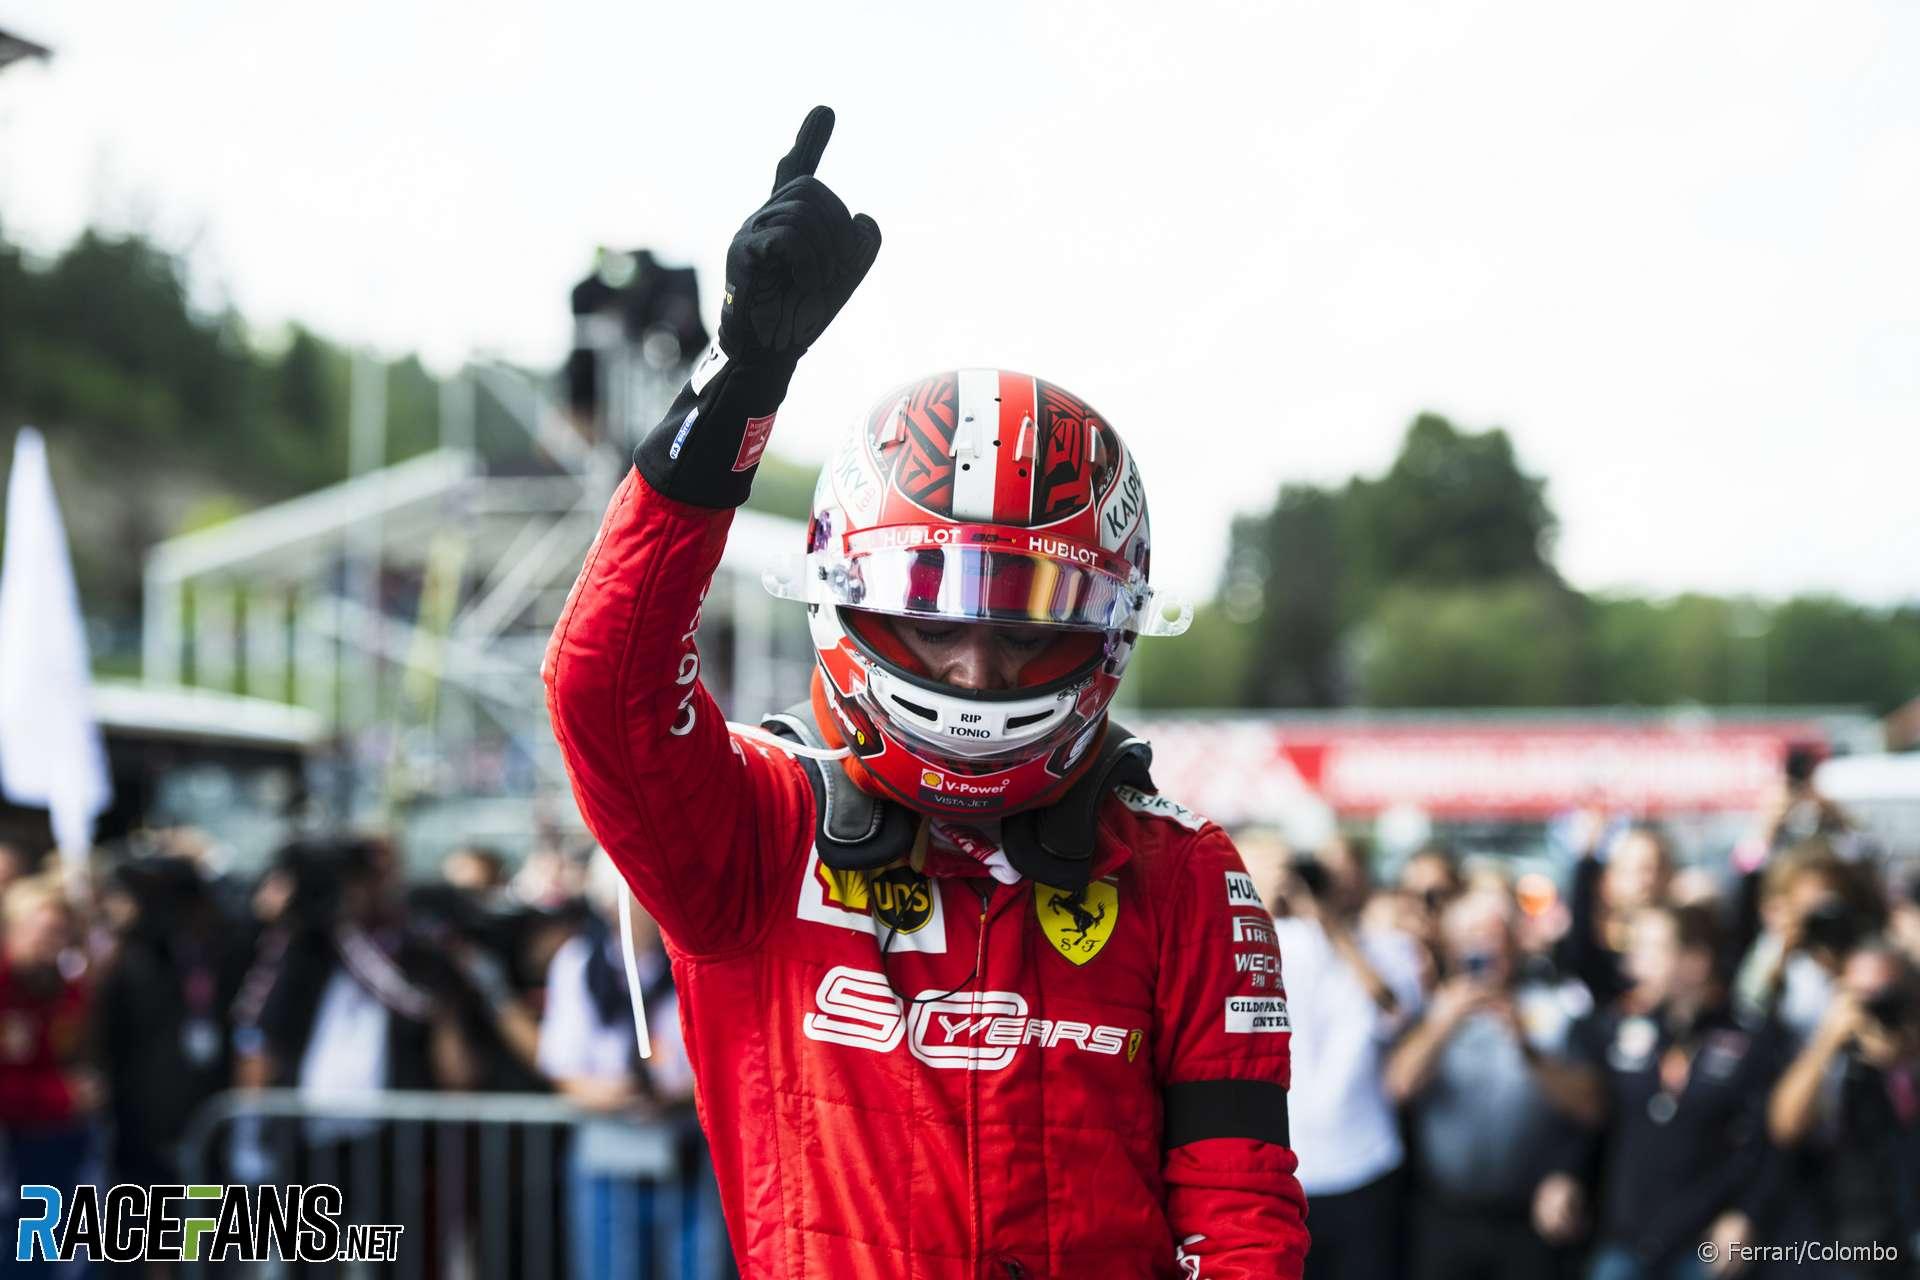 F1 2020 My Own Team Racefansdotnet-20190901-163844-29